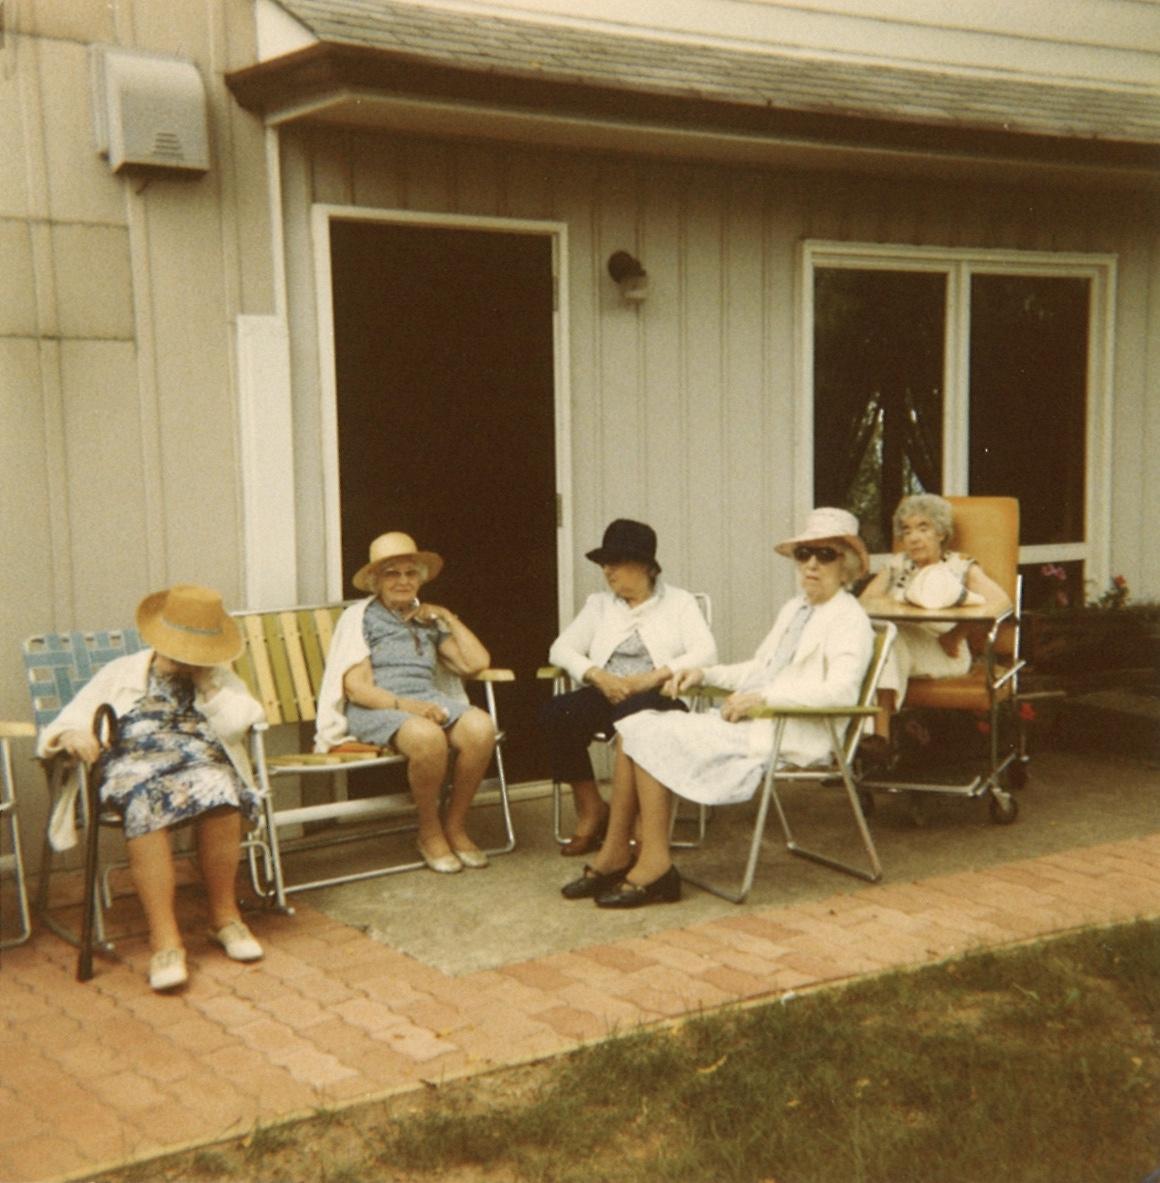 A few CAMA residents enjoying the outdoors, circa 1970.